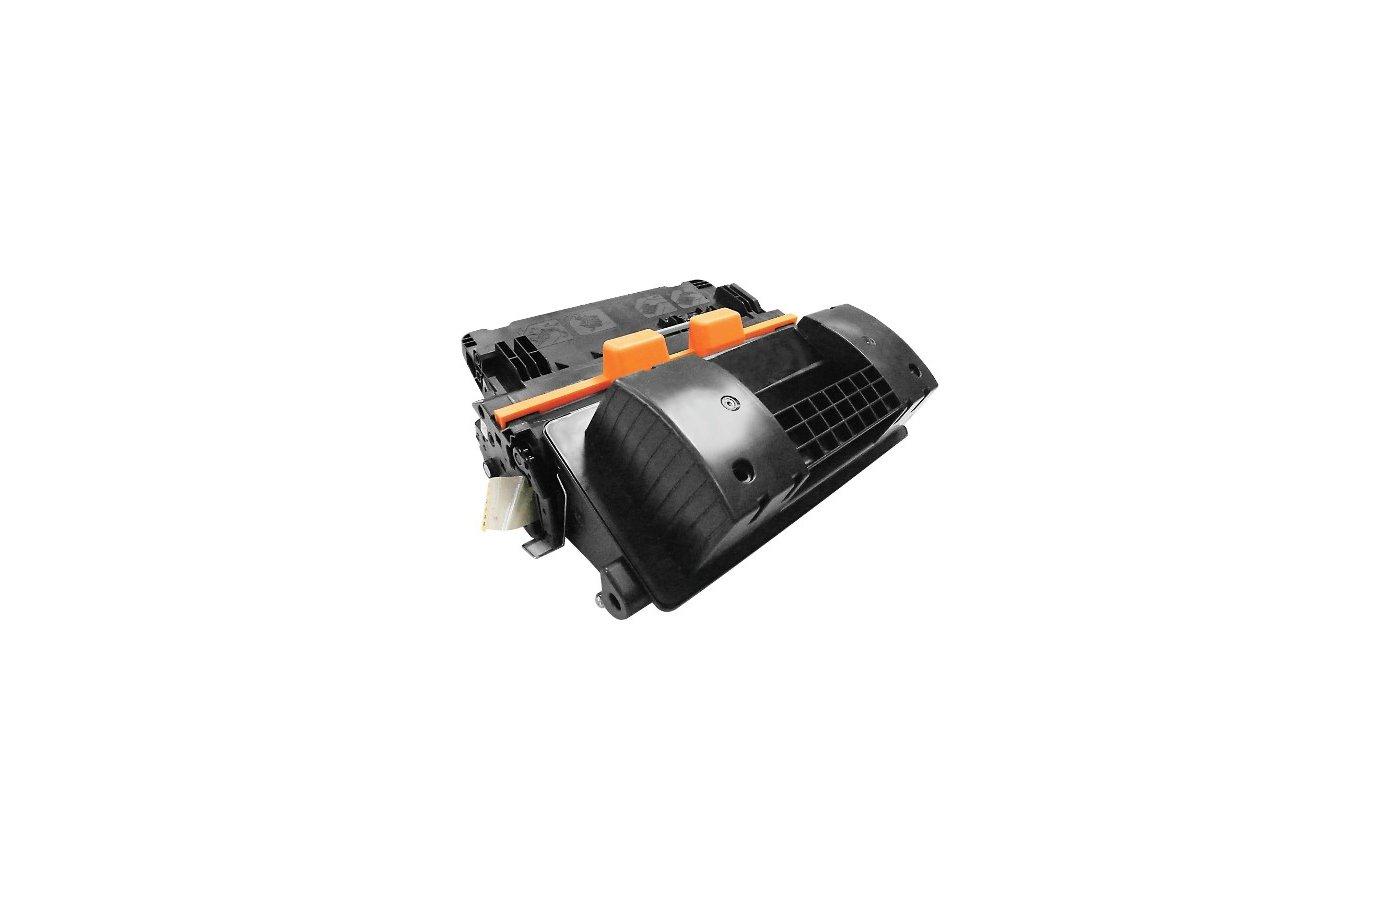 Картридж лазерный HP 81X CF281X черный для LaserJet Pro MFP M630dn/f/h/z (25000стр.)